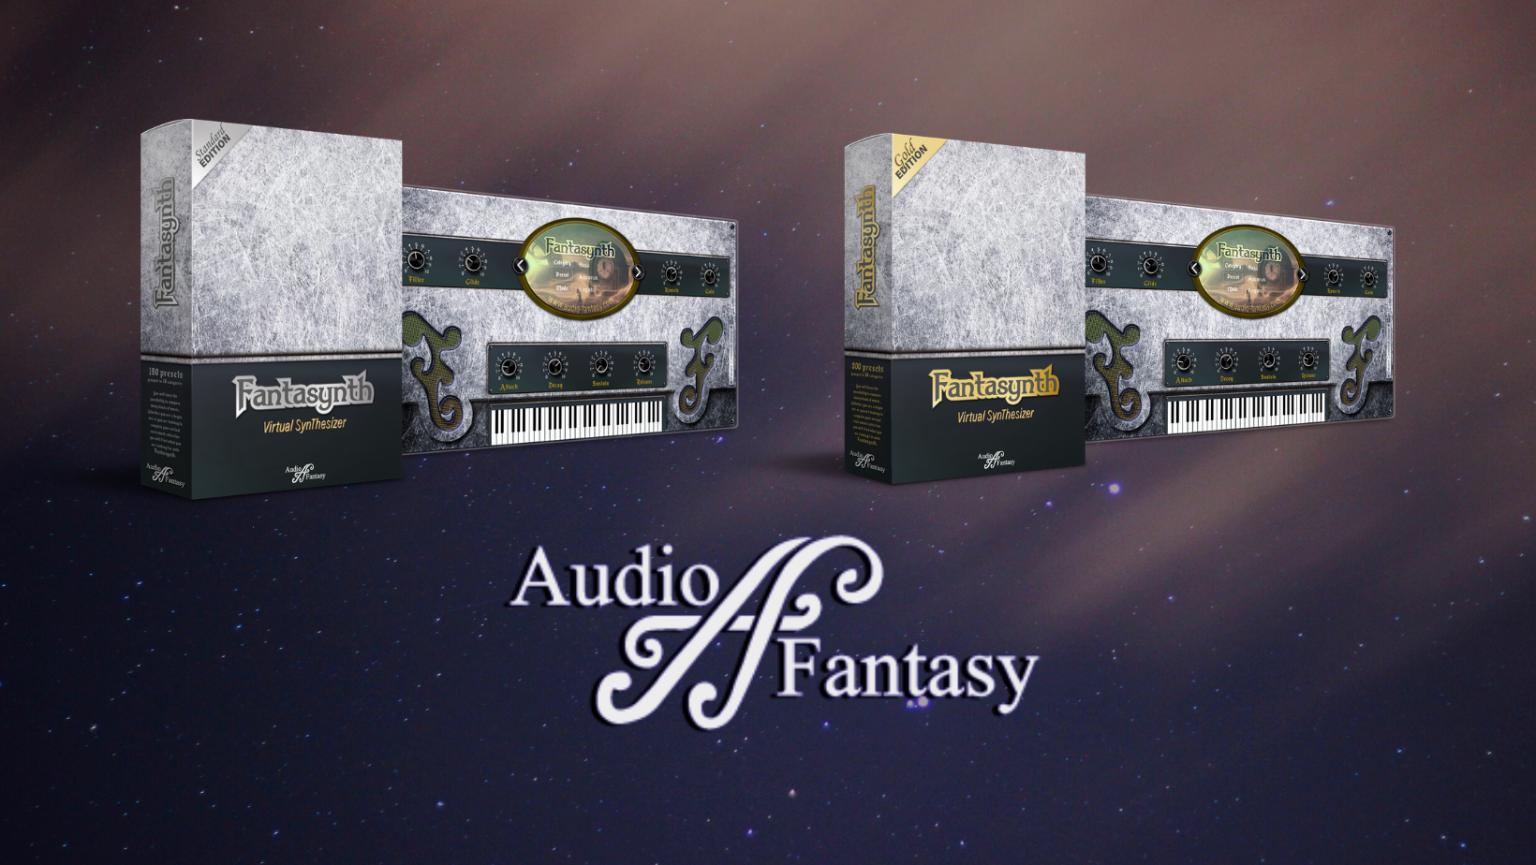 test fantasynth audio fantasy